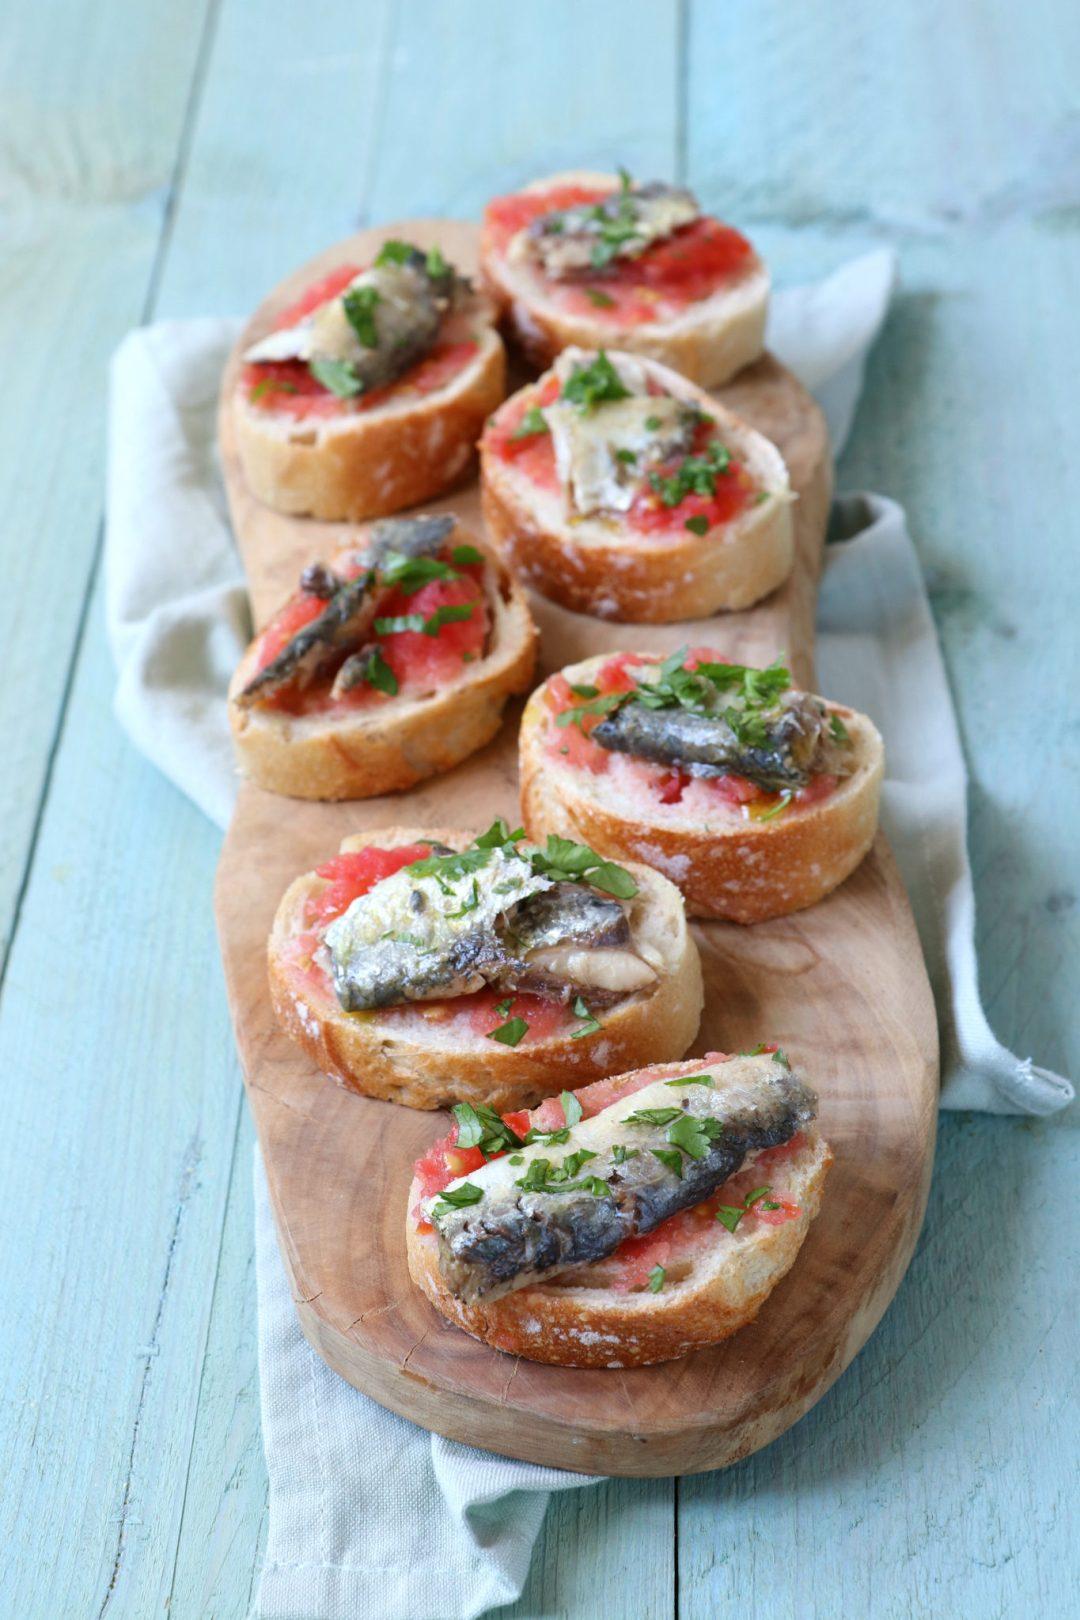 Recept Pan con tomate met sardine www.jaimyskitchen.nl